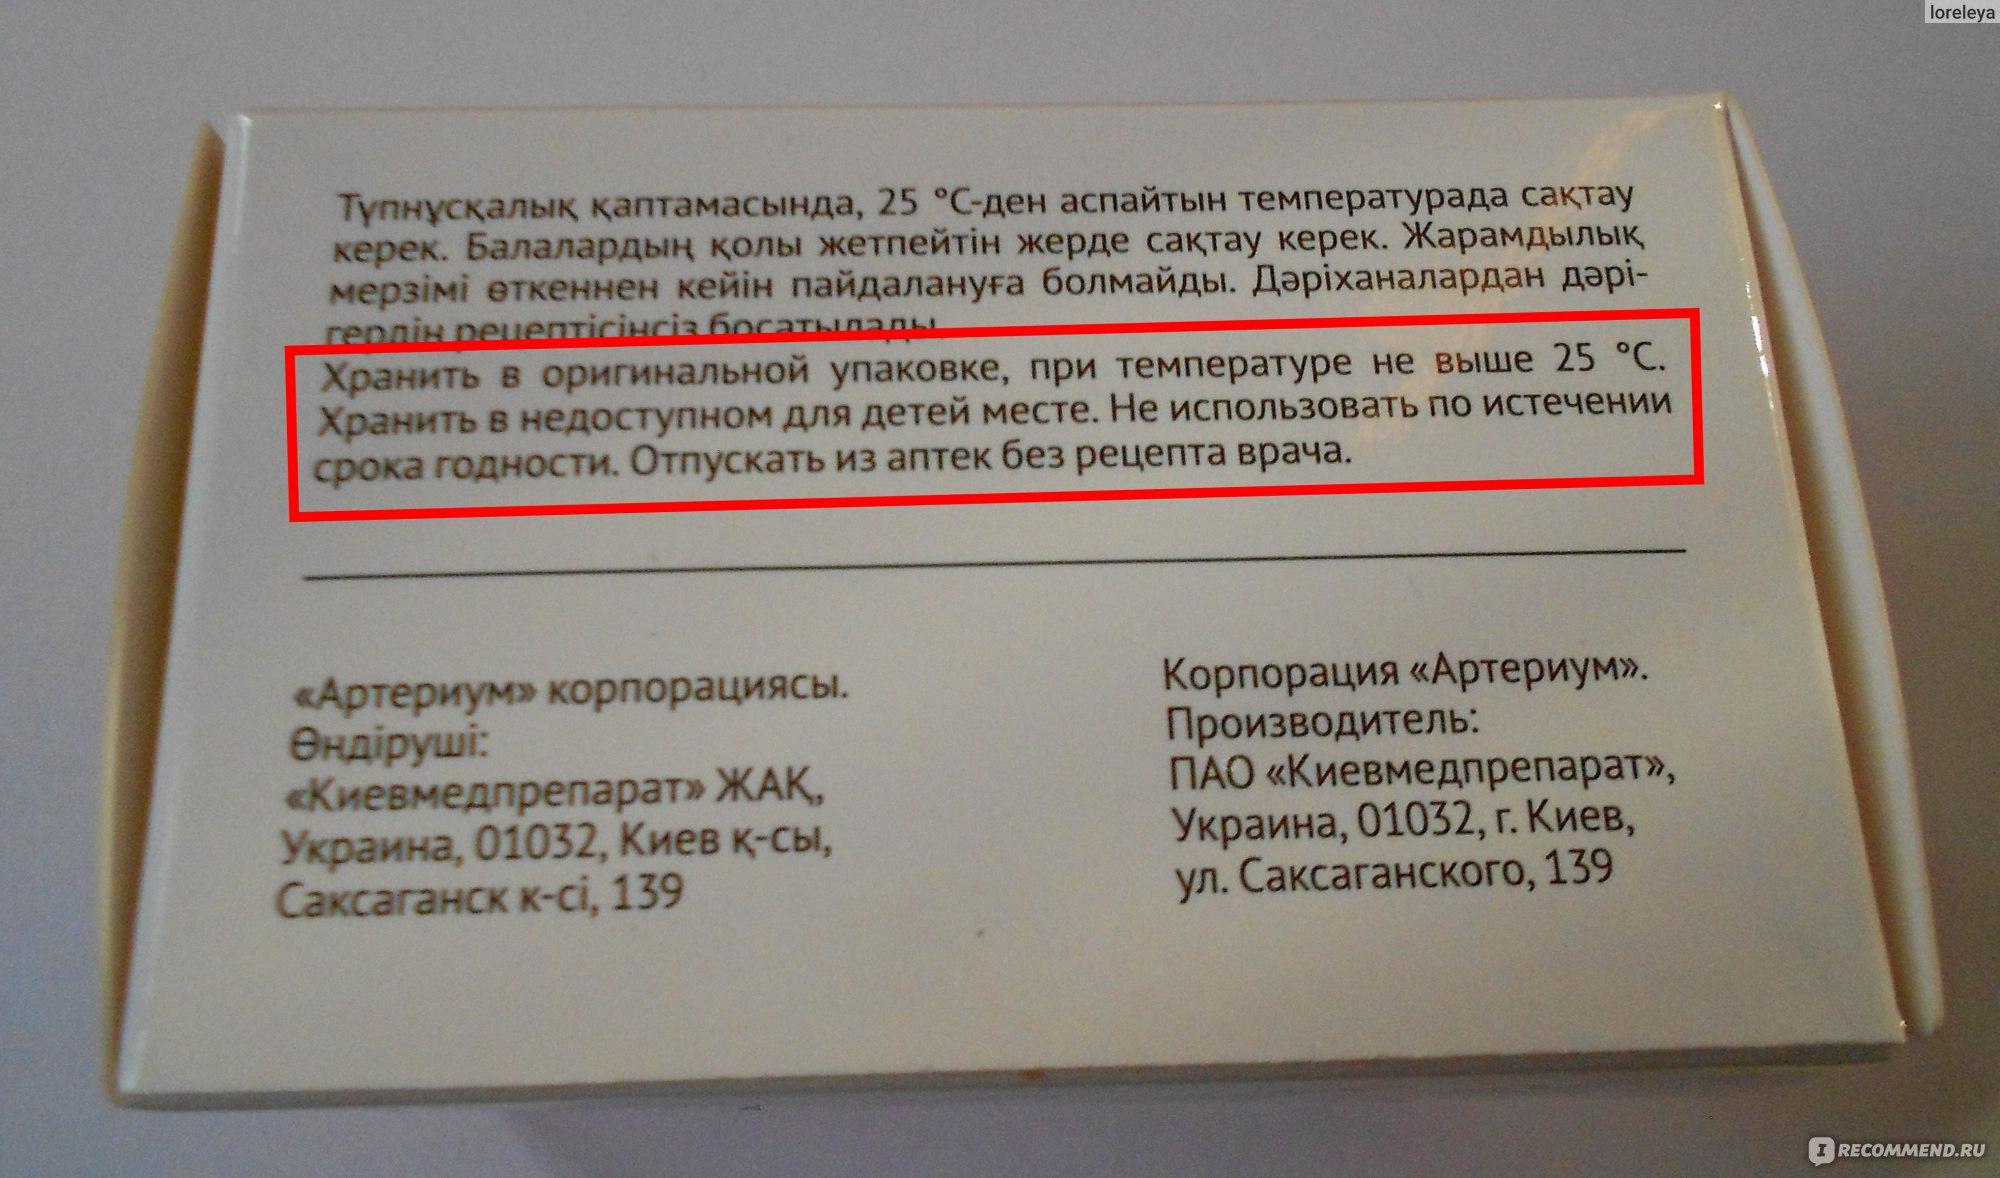 Таблетки диофлан: инструкция